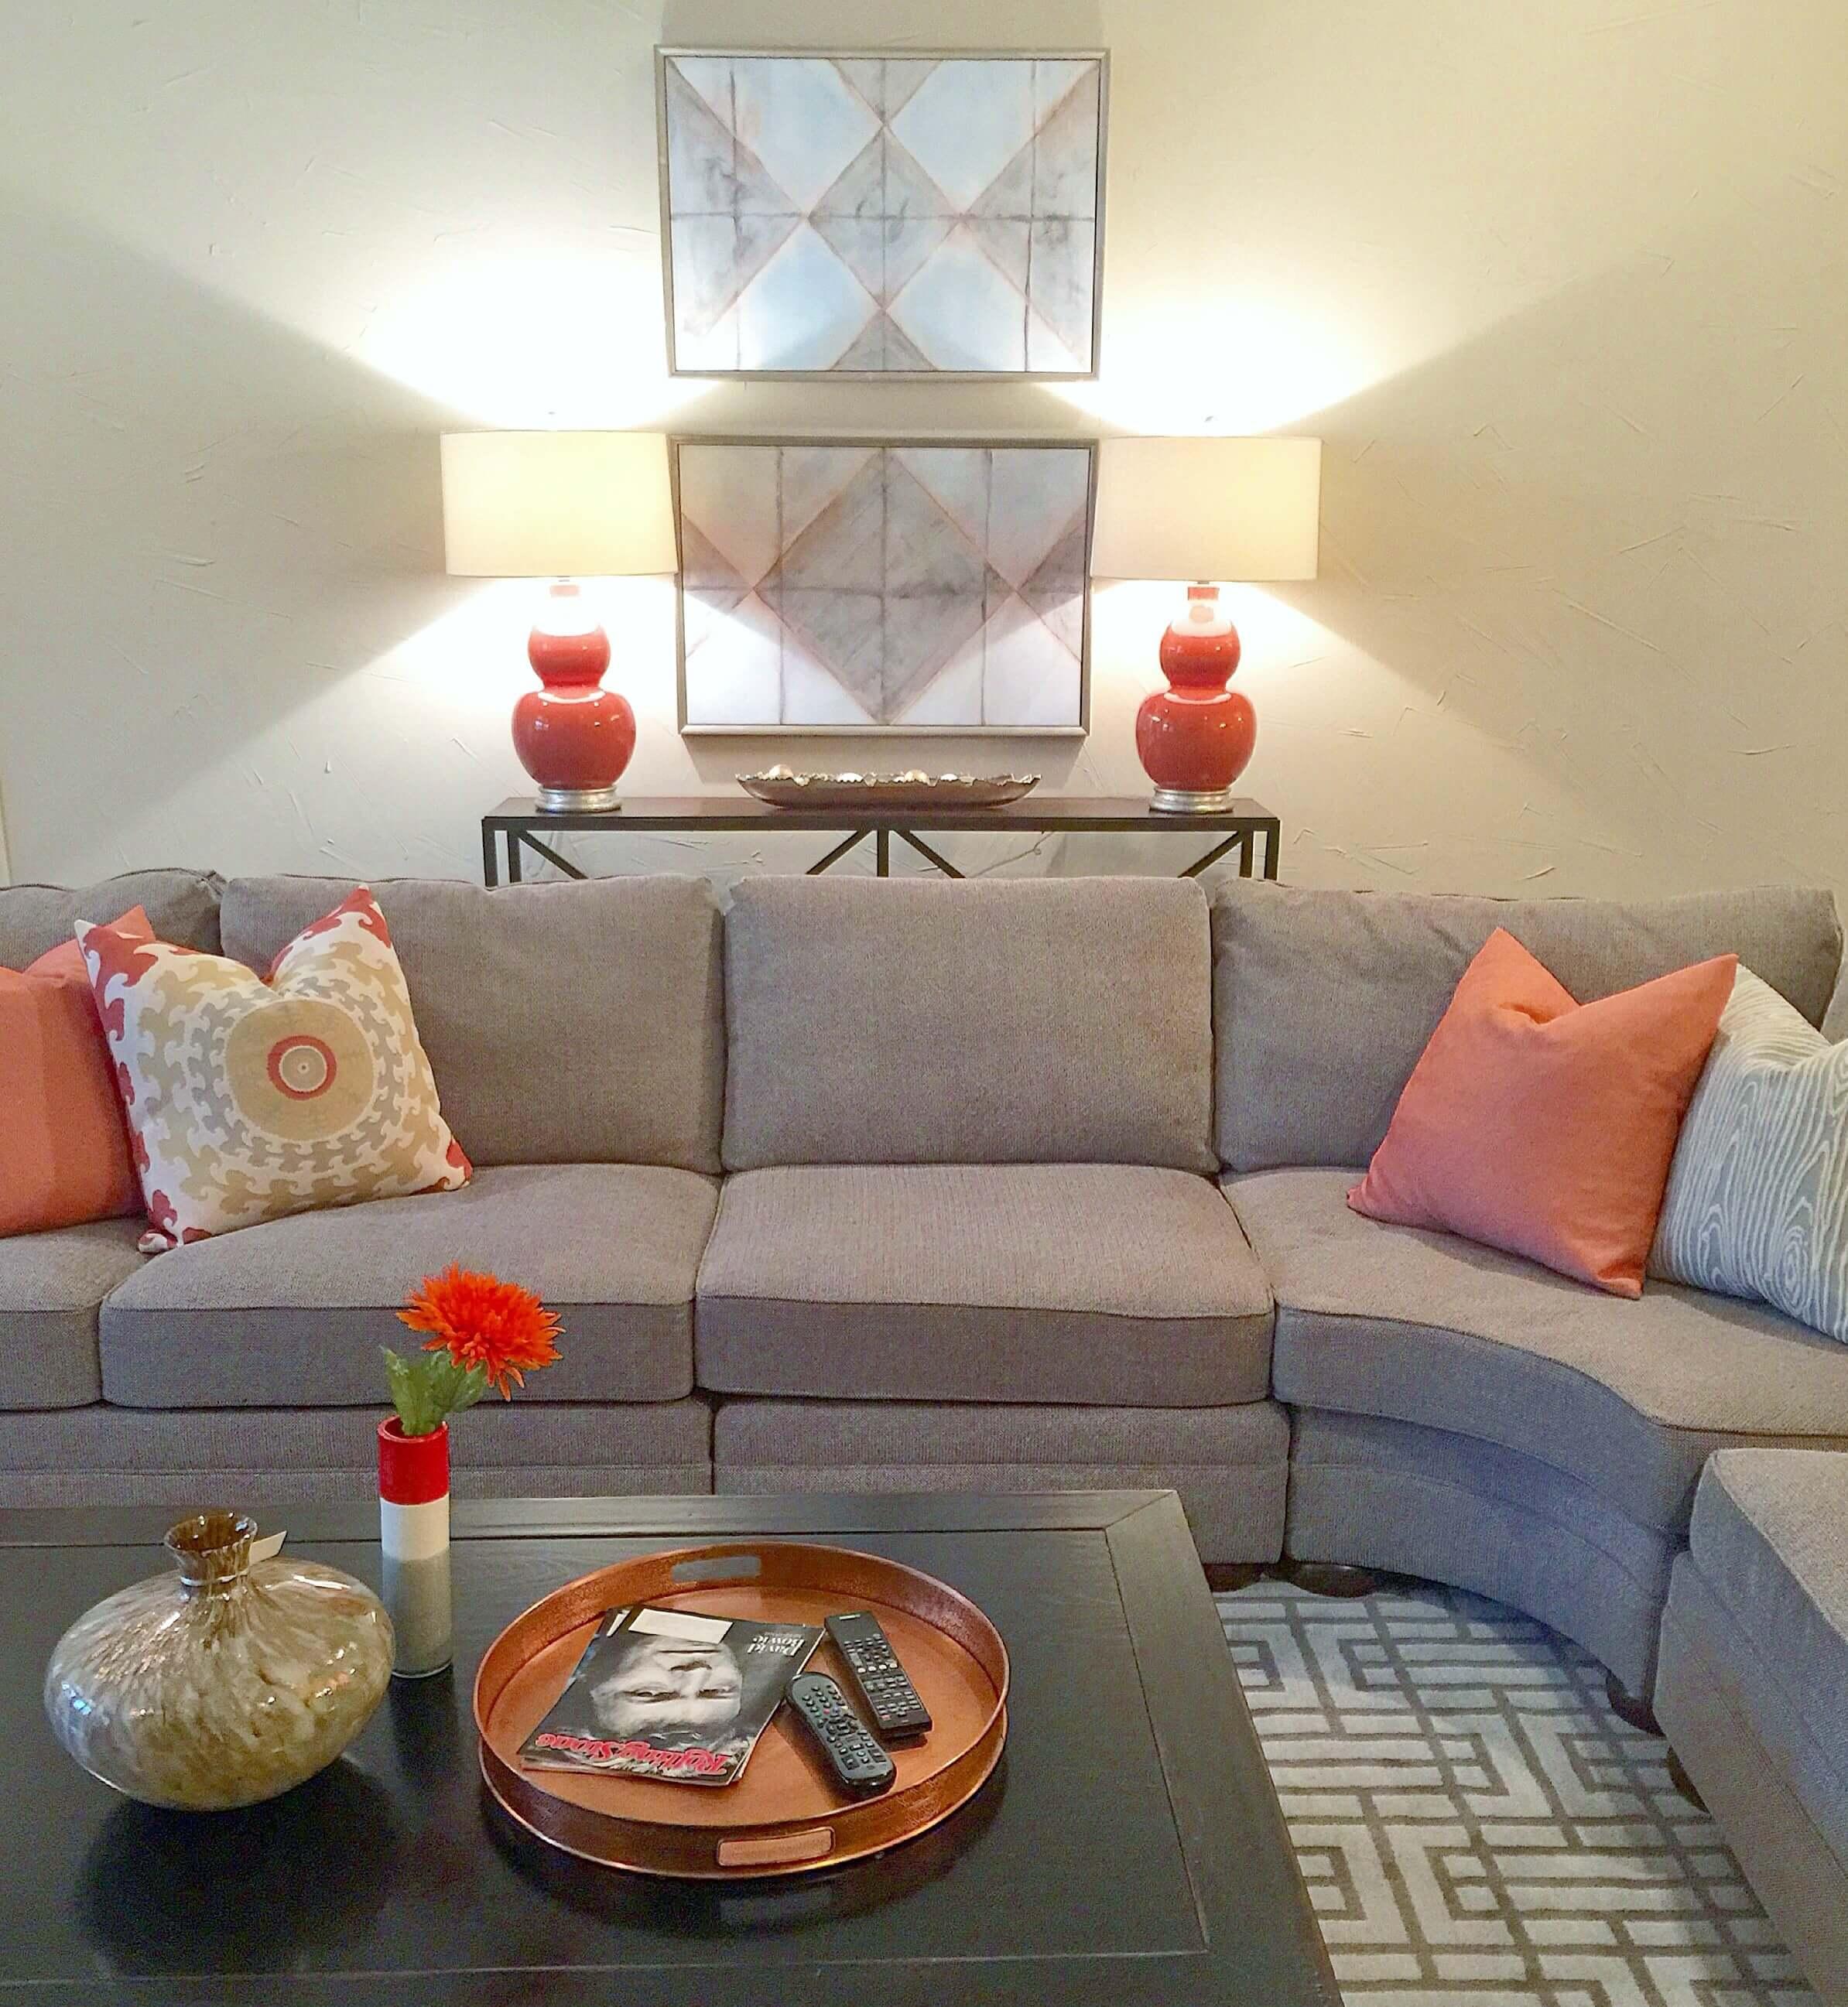 Orange pillows and accessories add some life to this gray sofa. Carla Aston, Designer #pillows #livingroom #homedecor #livingroomideas